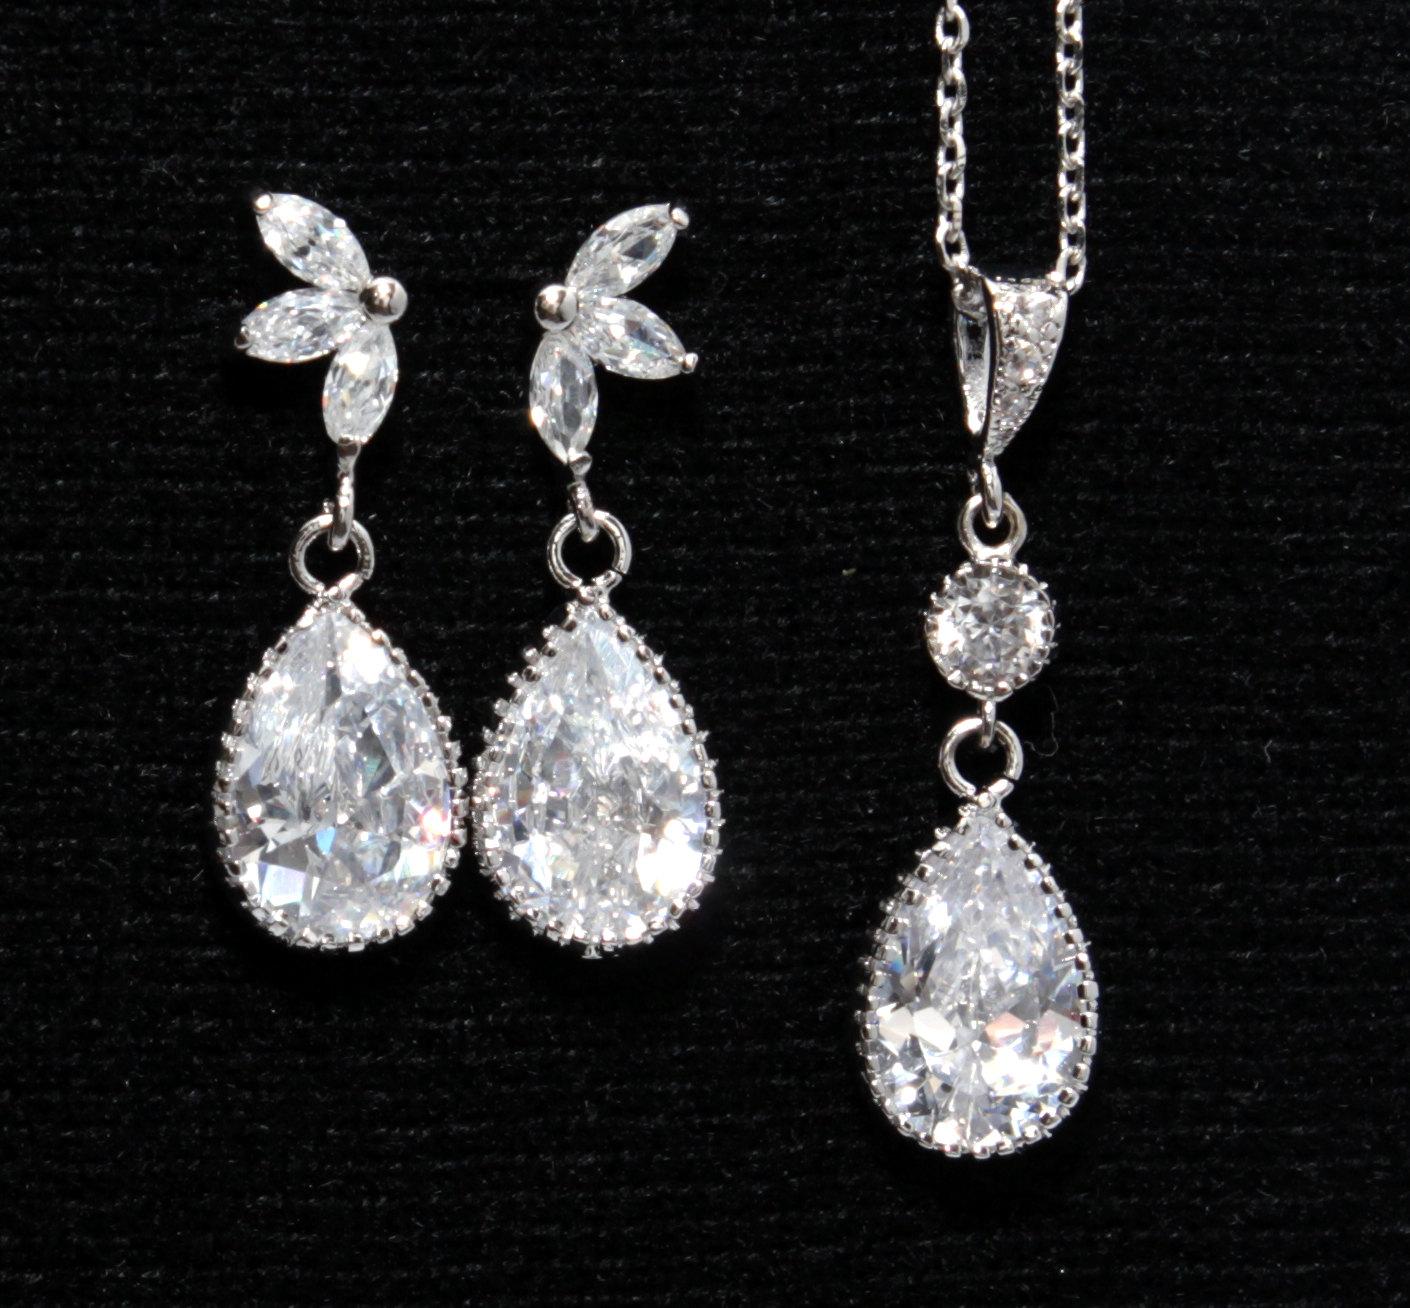 Tacita - Earrings & Necklace Set from Glitz & Love